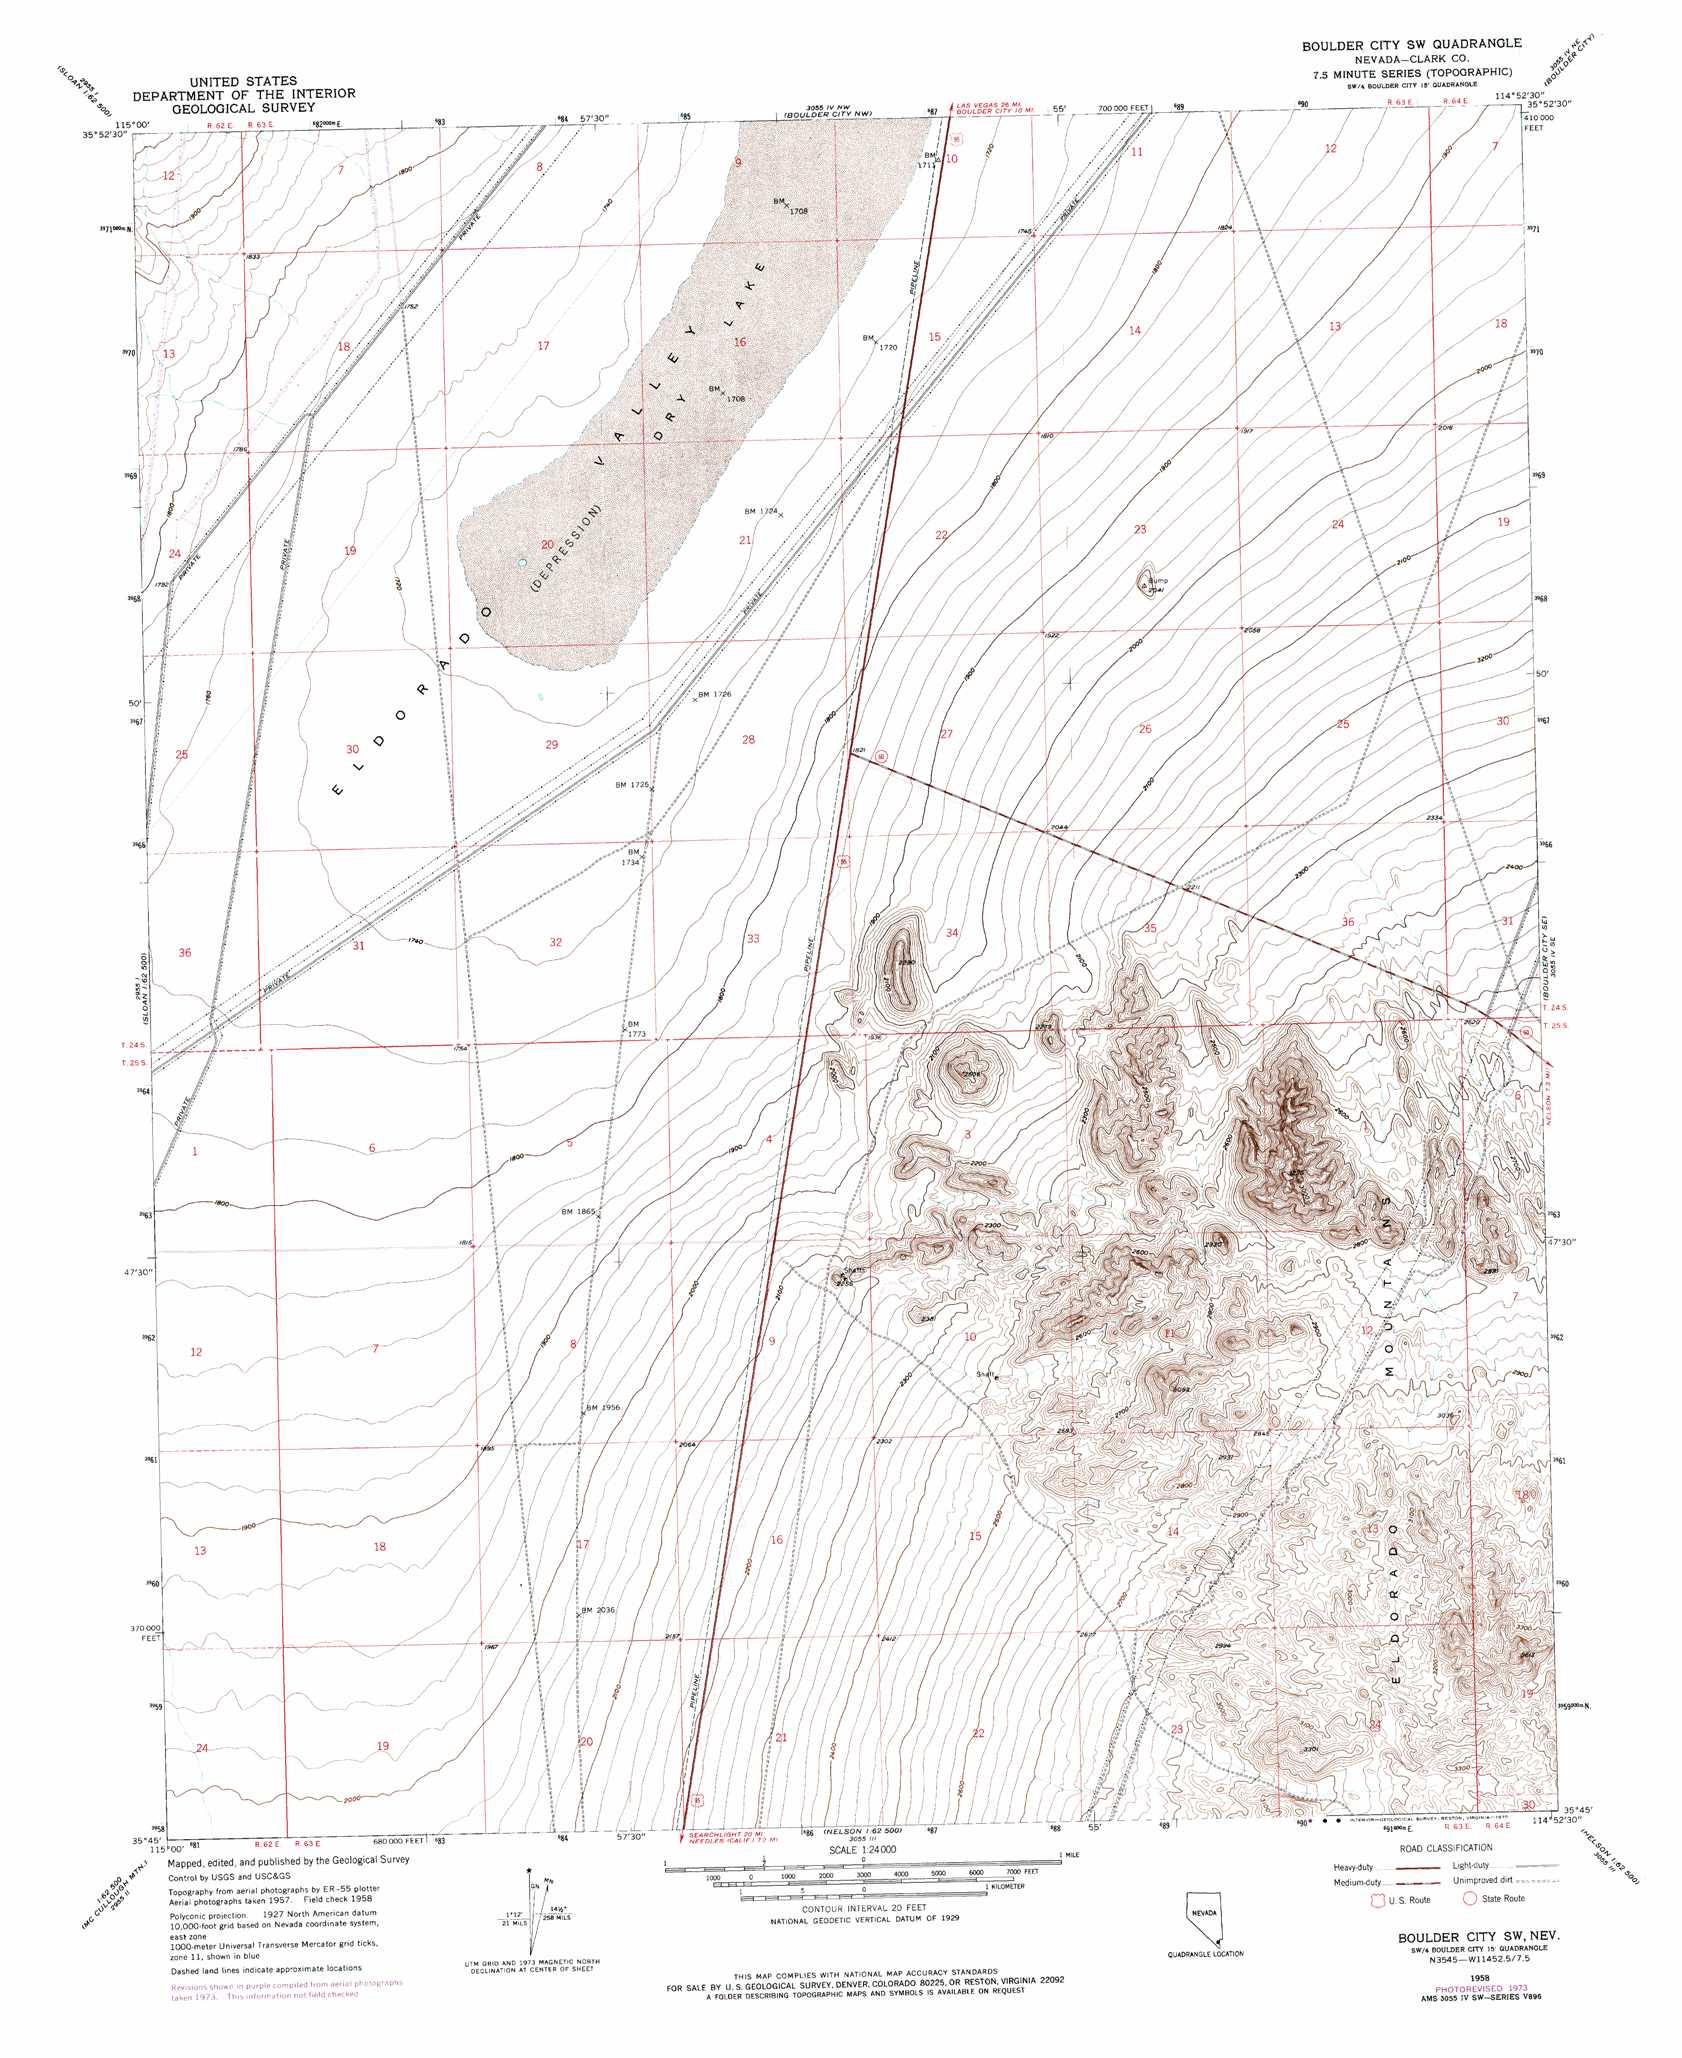 Boulder City Sw Topographic Map NV  USGS Topo Quad 35114g8